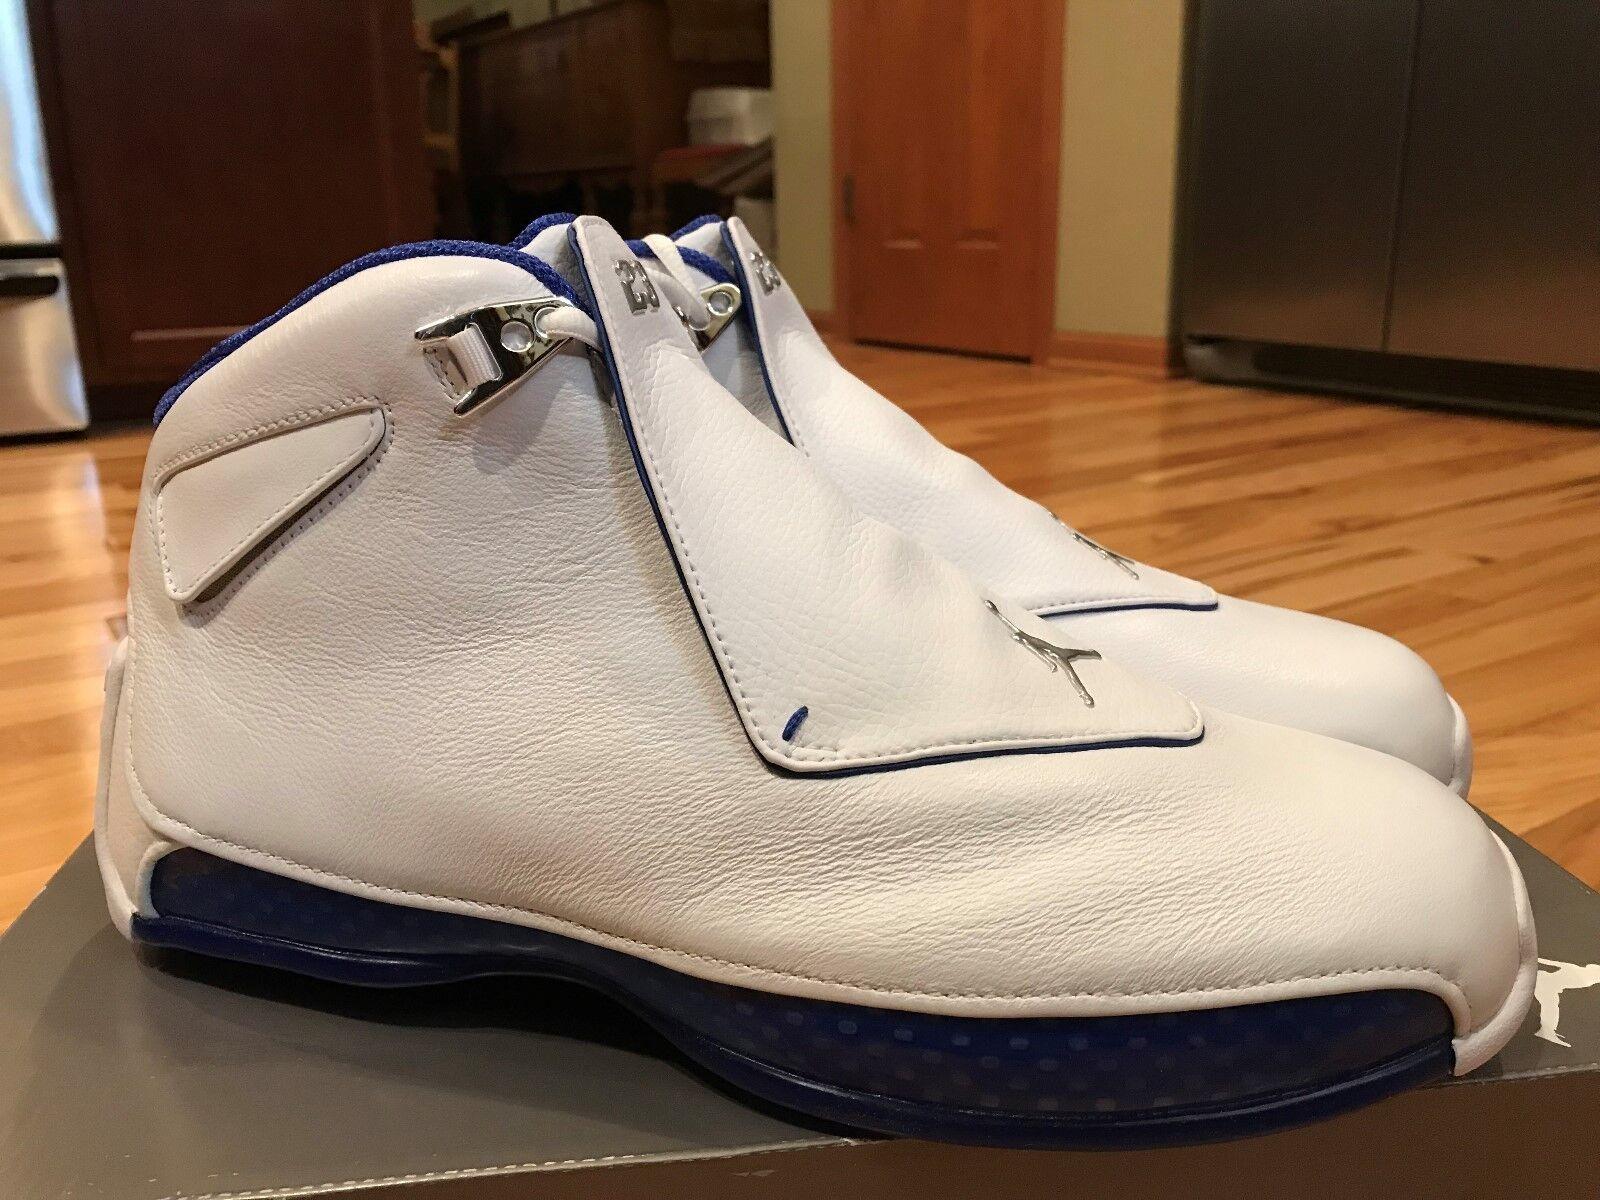 1f216363b8 Nike Air Jordan 18 Retro White Royal bluee Silver AA2494 106 Size 12  NOBOXTOP. Special field Air Force 1 ...